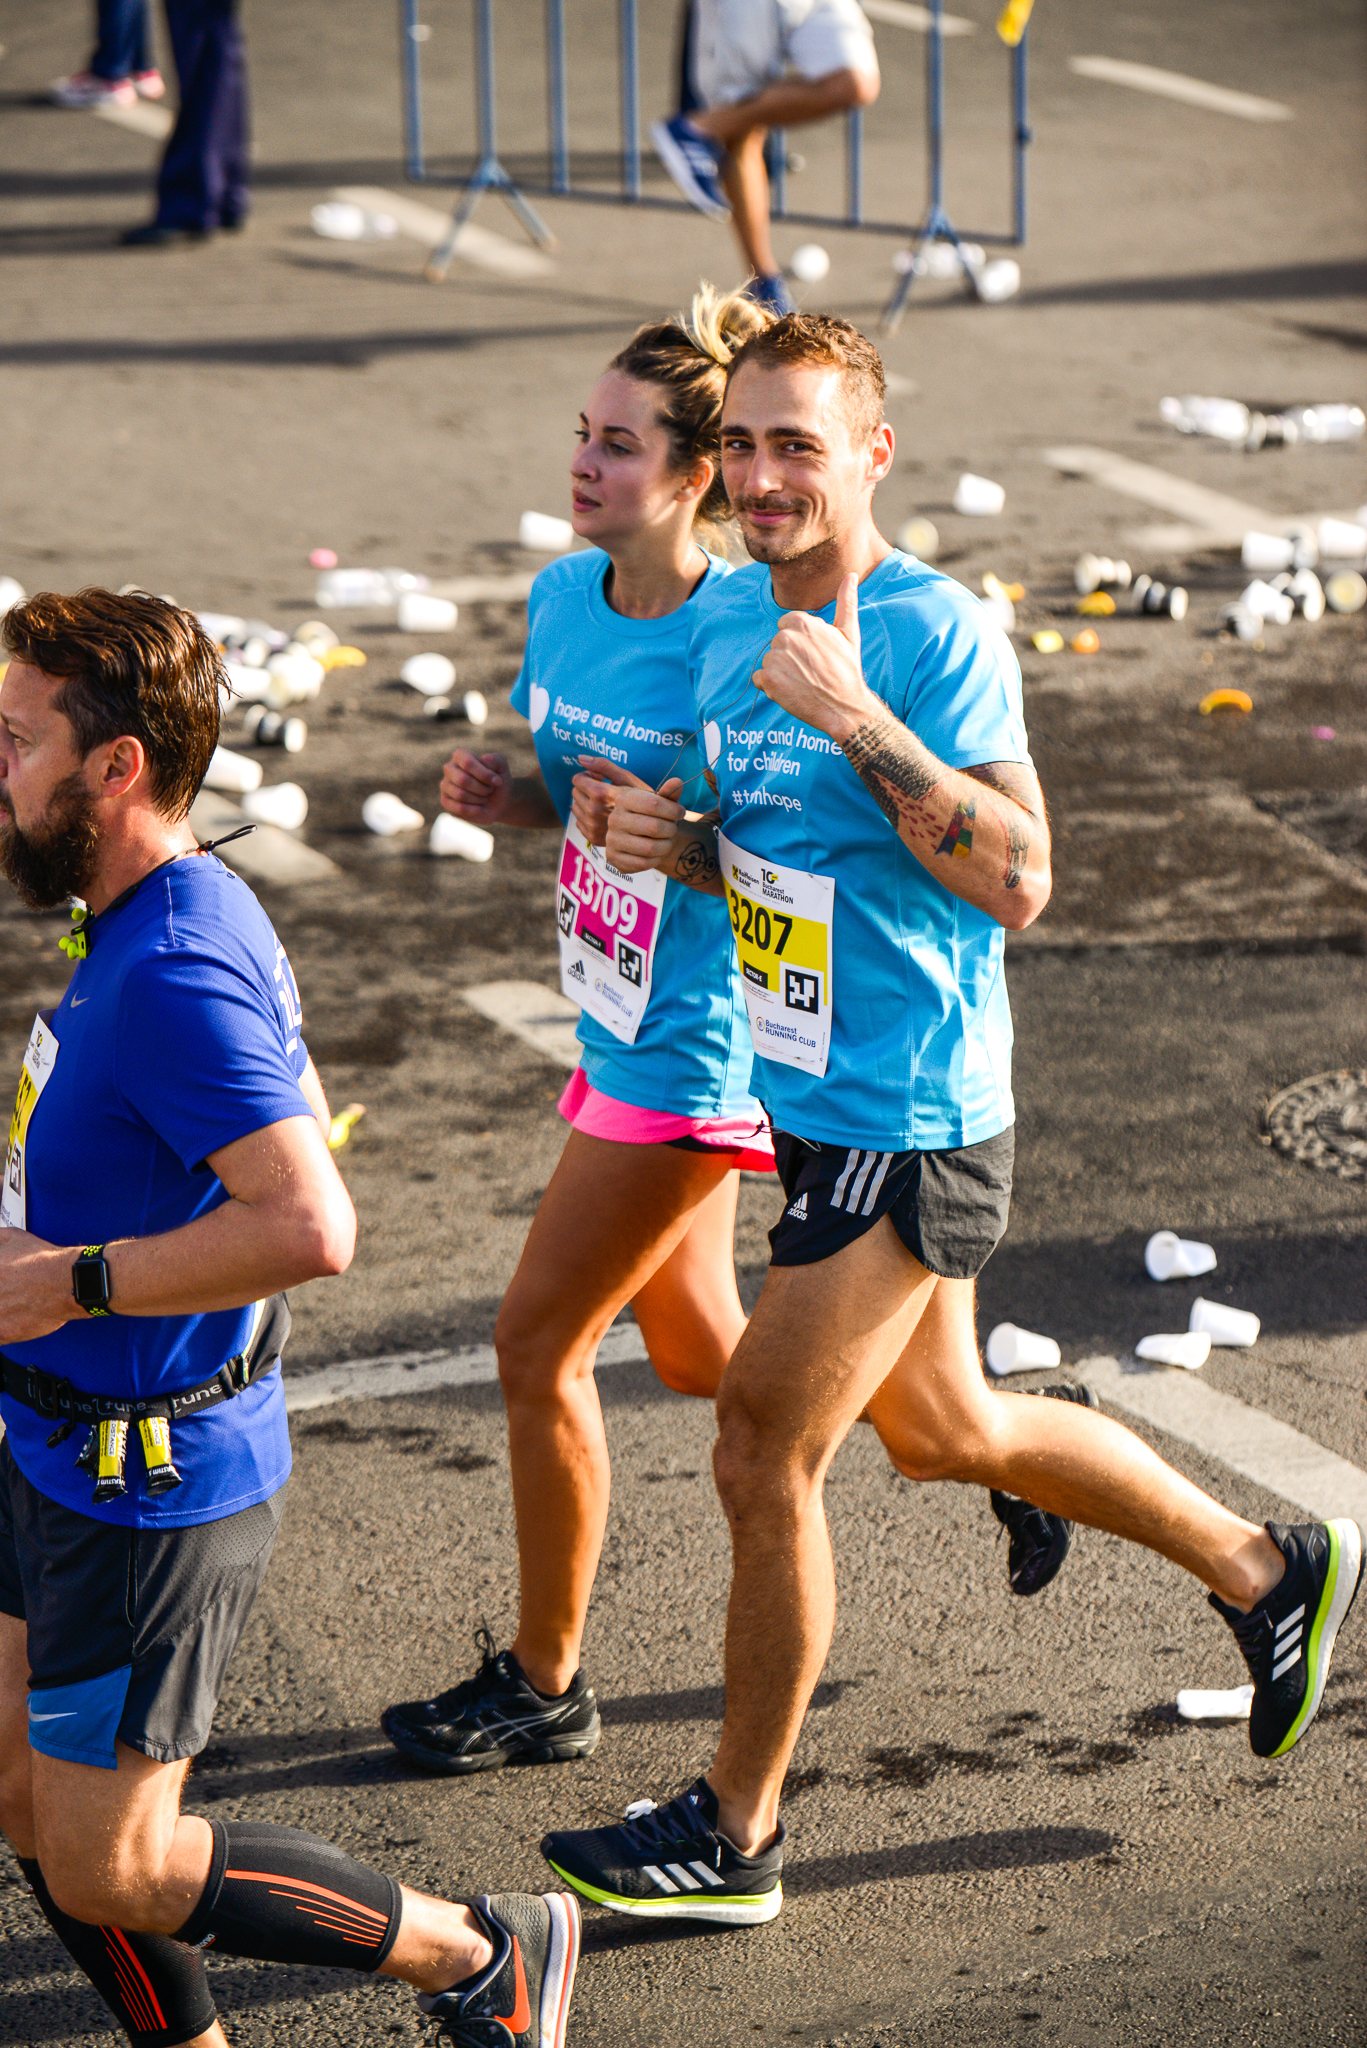 Otniela Sandu_Vladimir Draghia_Maratonul Bucuresti_Foto Radu Fugarescu.jpg